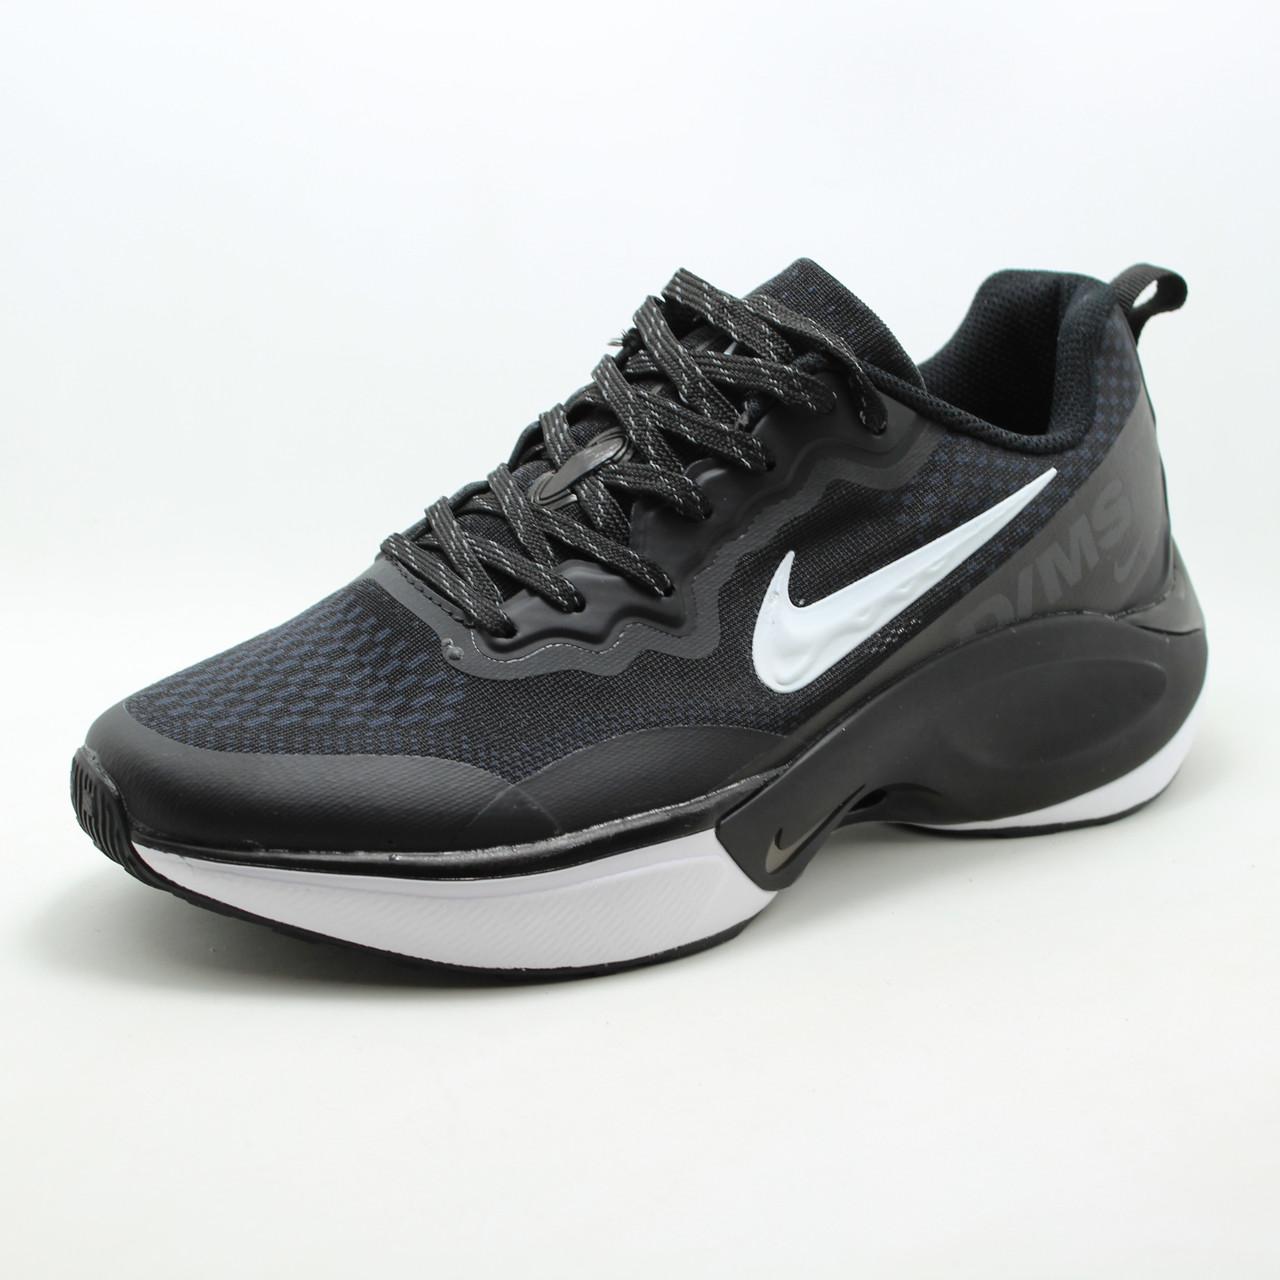 Мужские кроссовки Nike AT5603-003